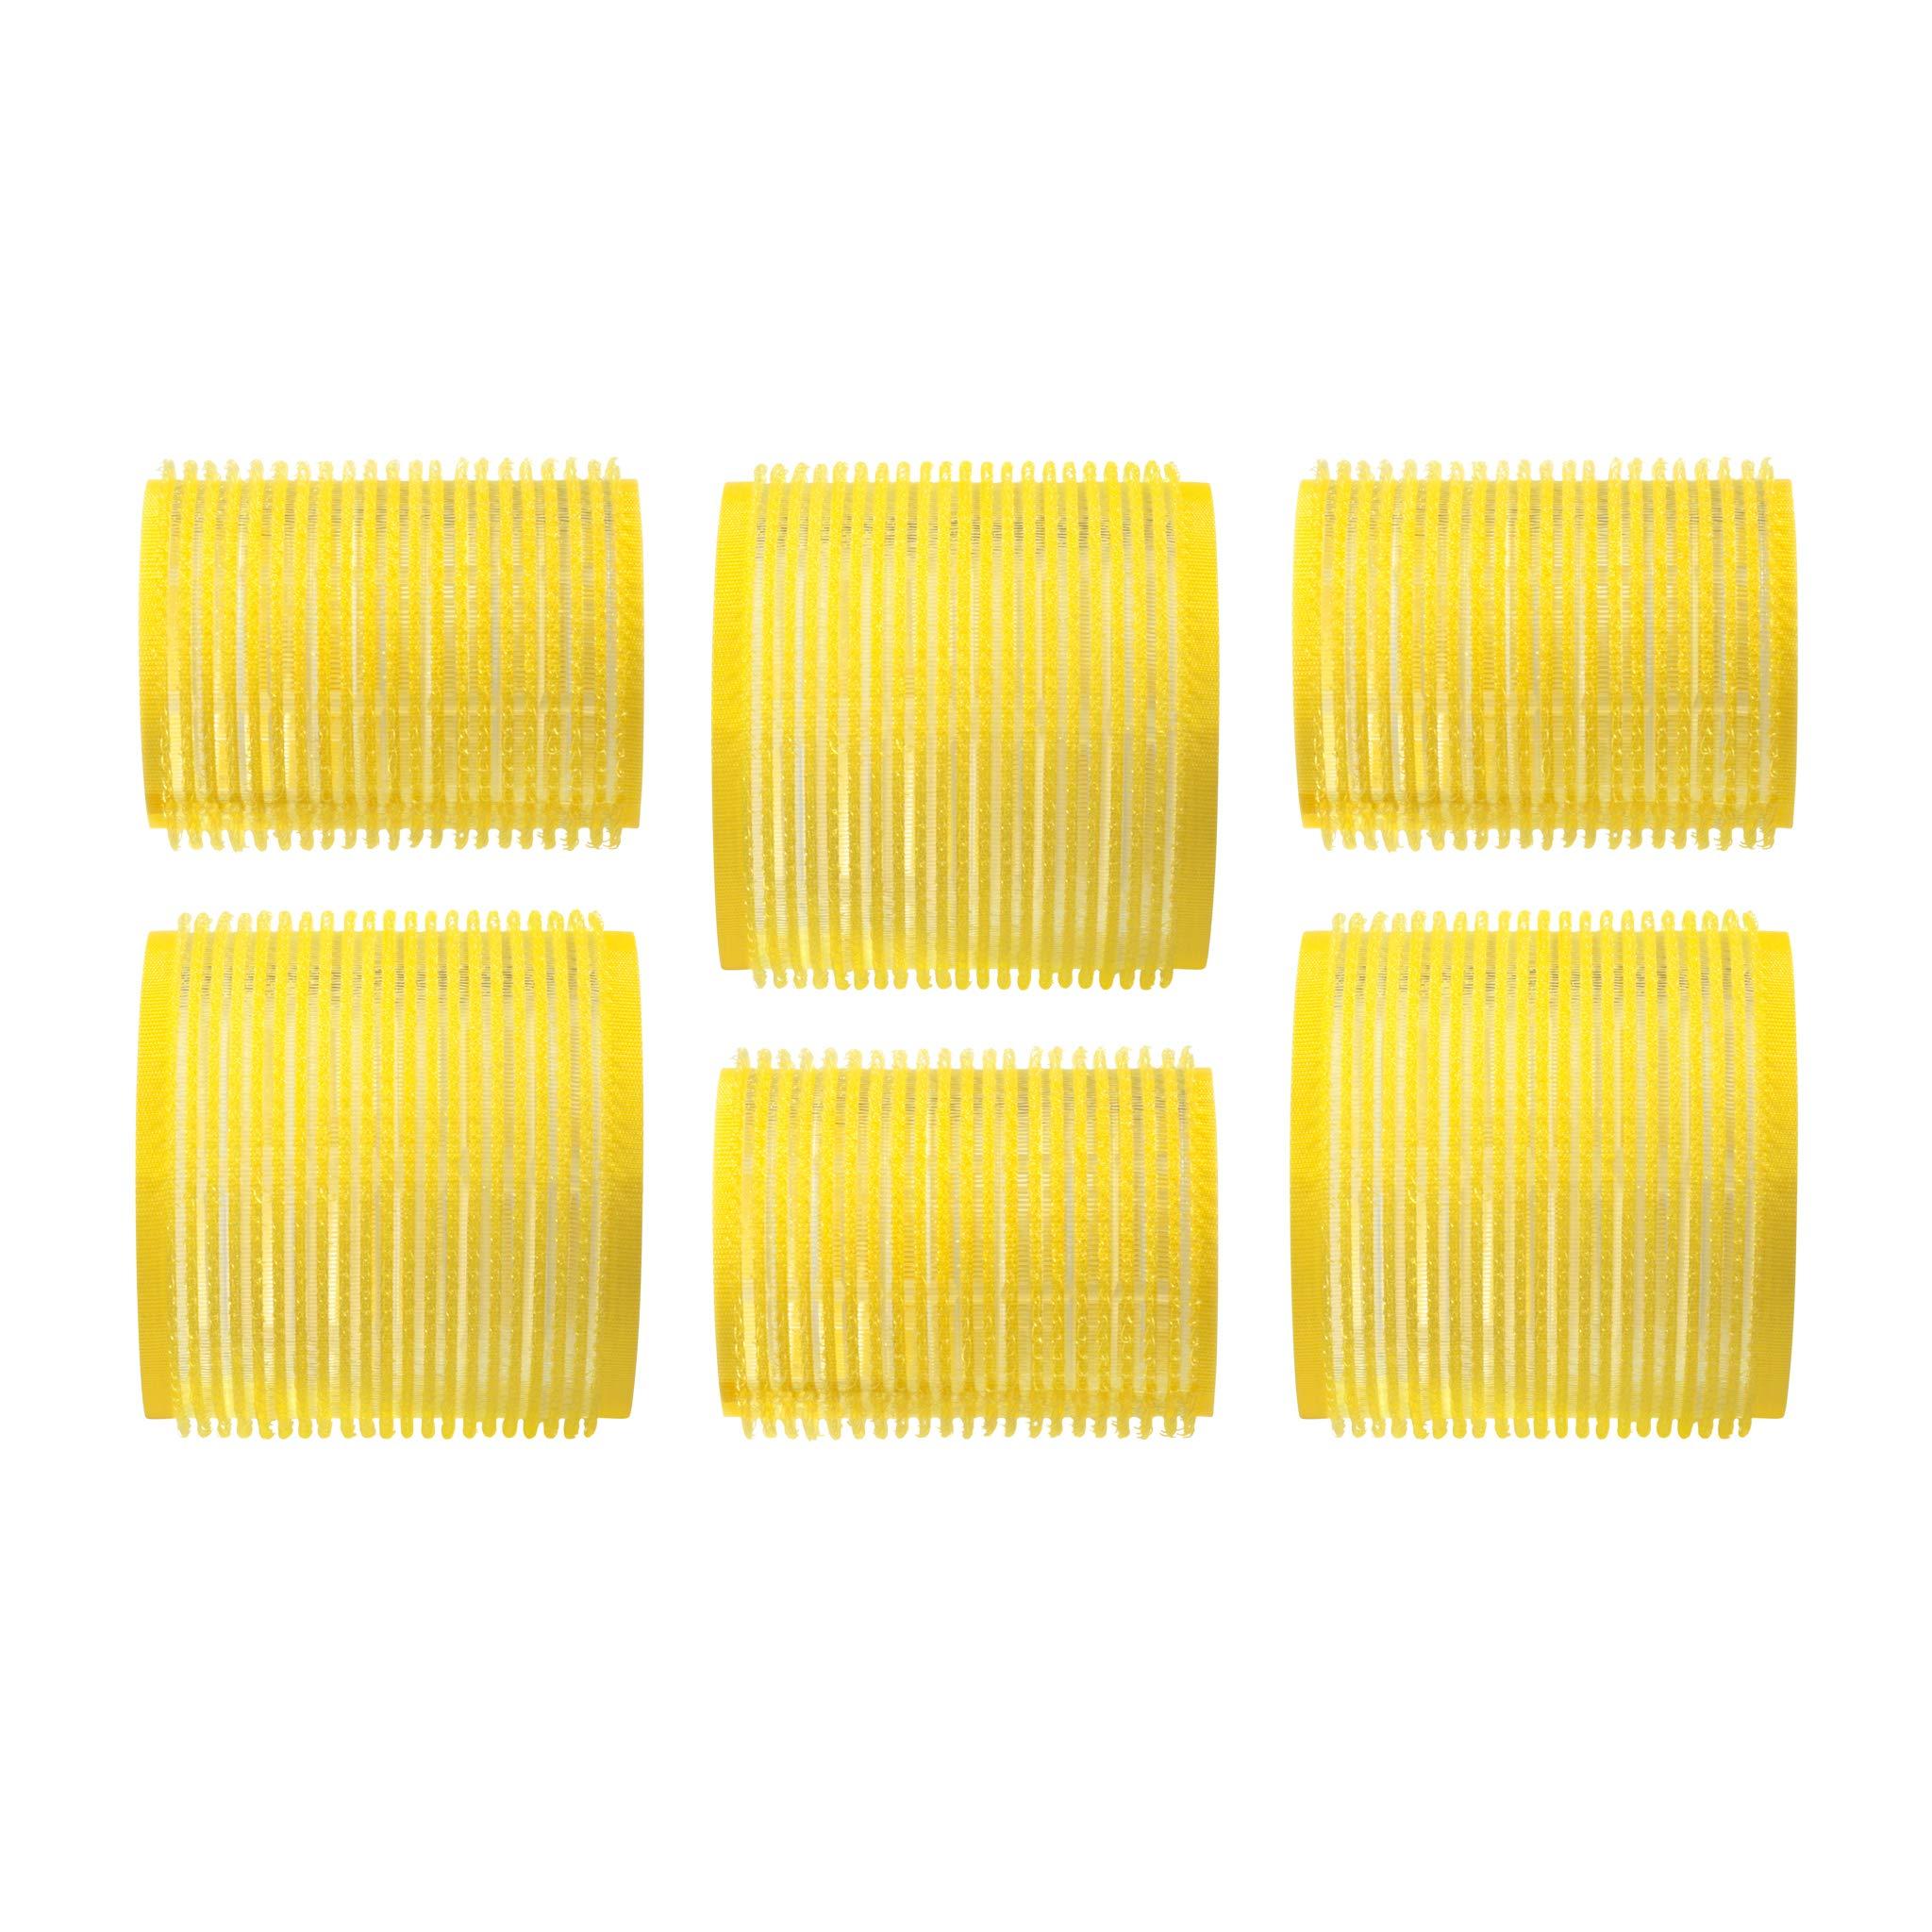 Drybar High Tops Self-Grip Rollers 6-pack (3 medium/3 large) by Drybar